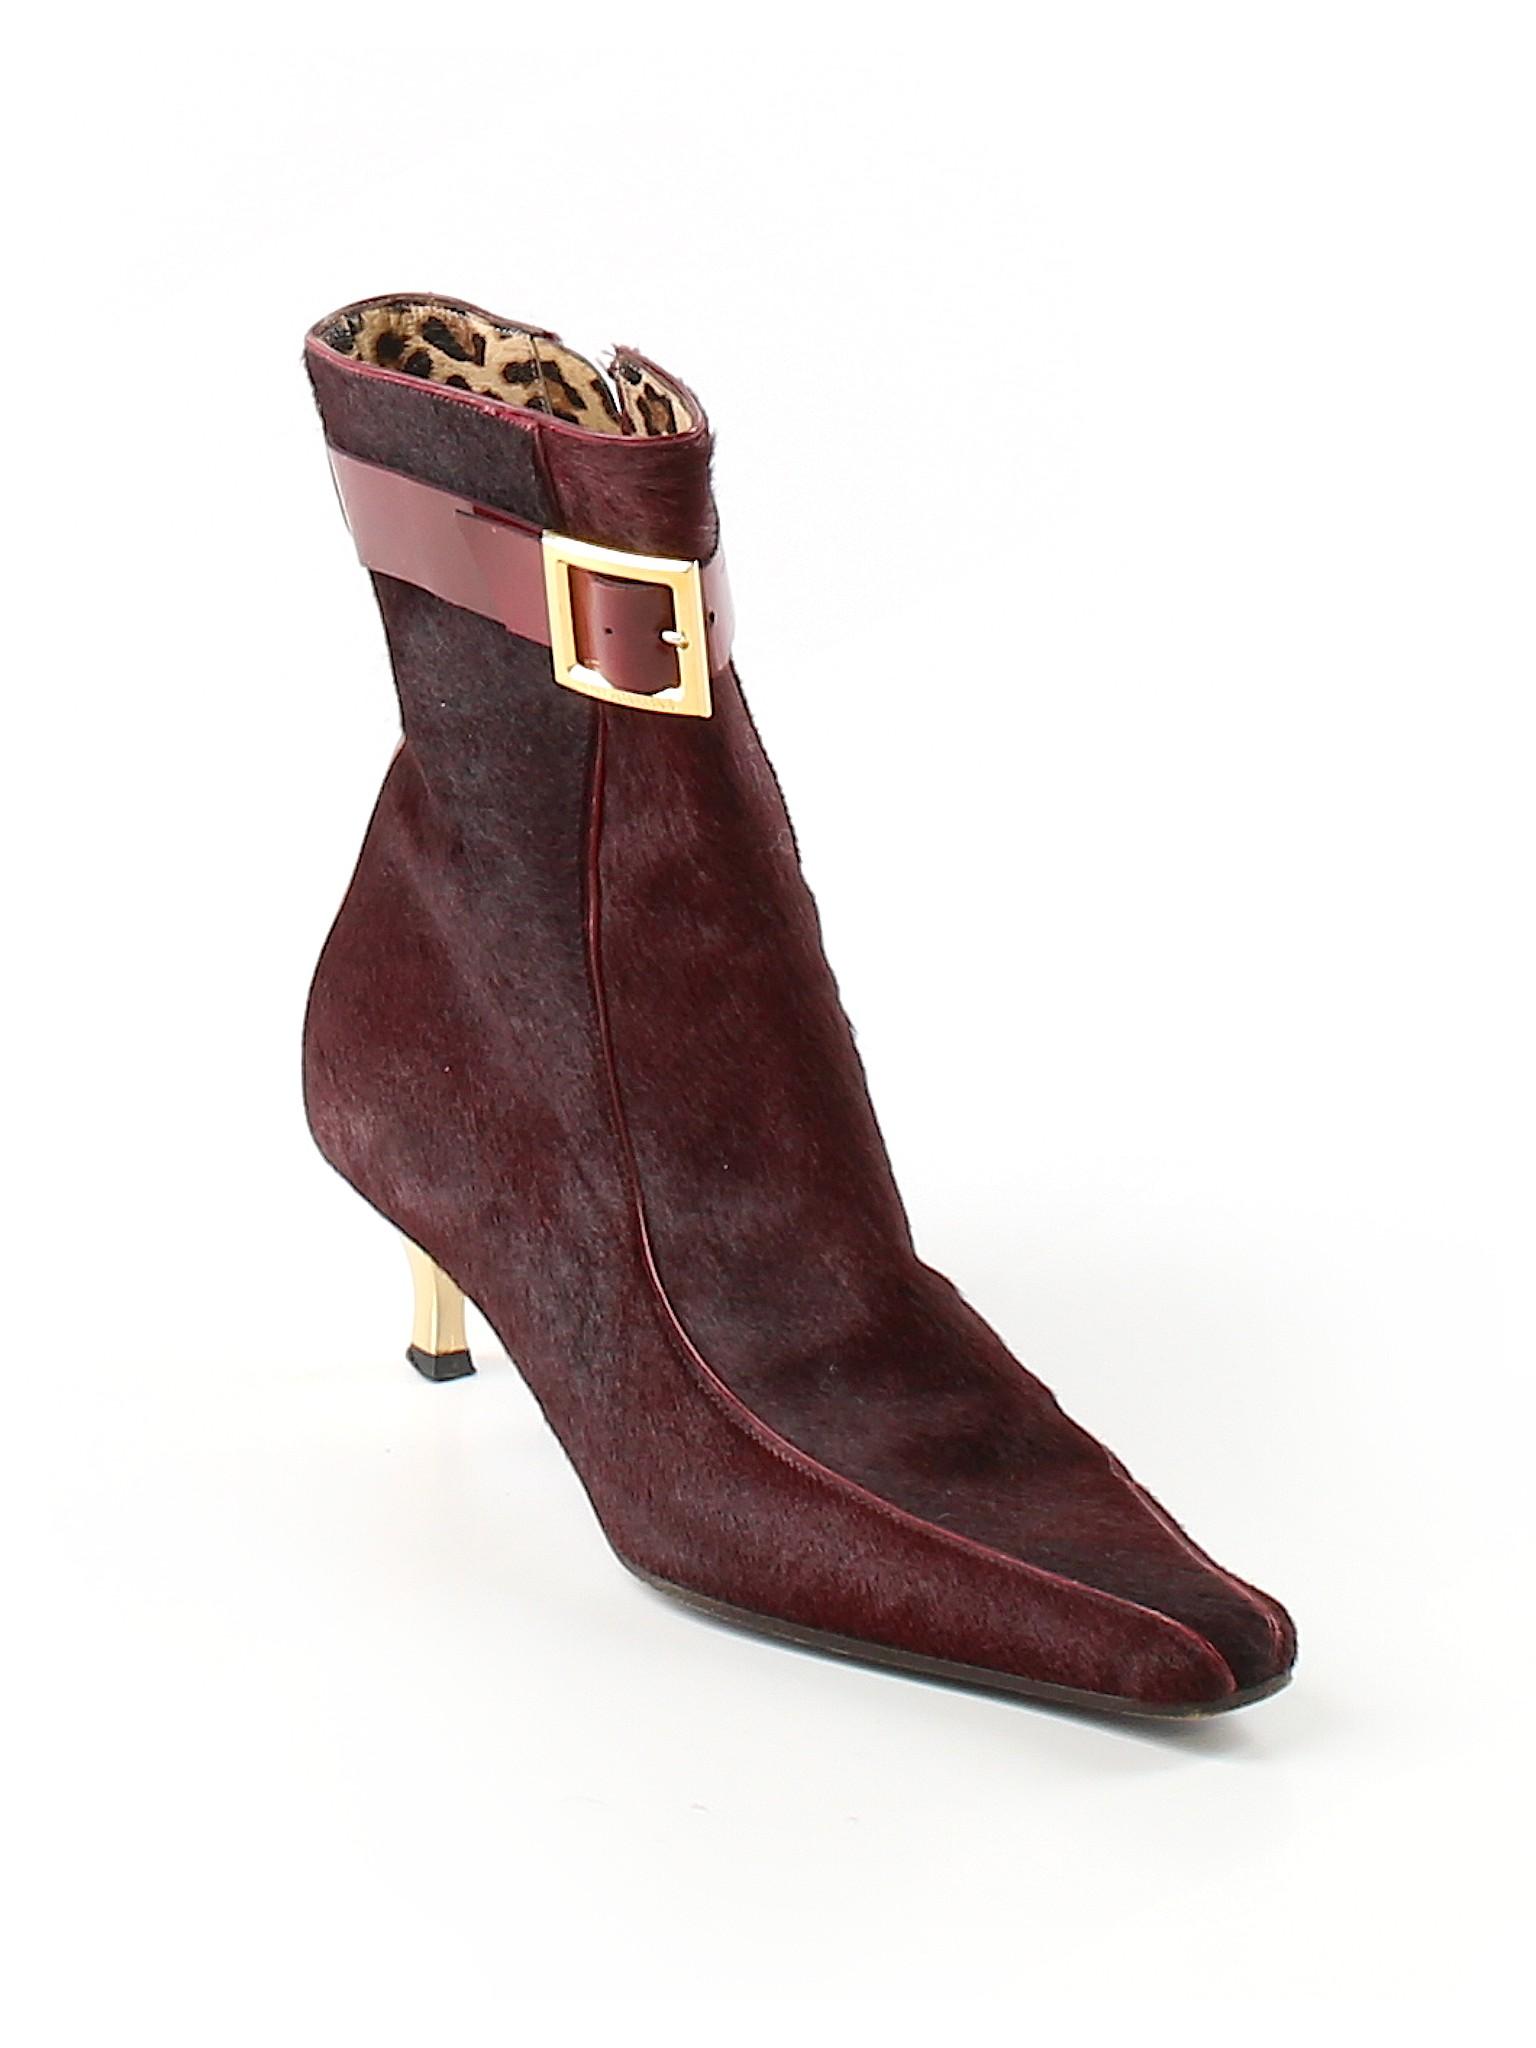 Boots Dolce Gabbana amp; promotion Boutique IF0qxT5x